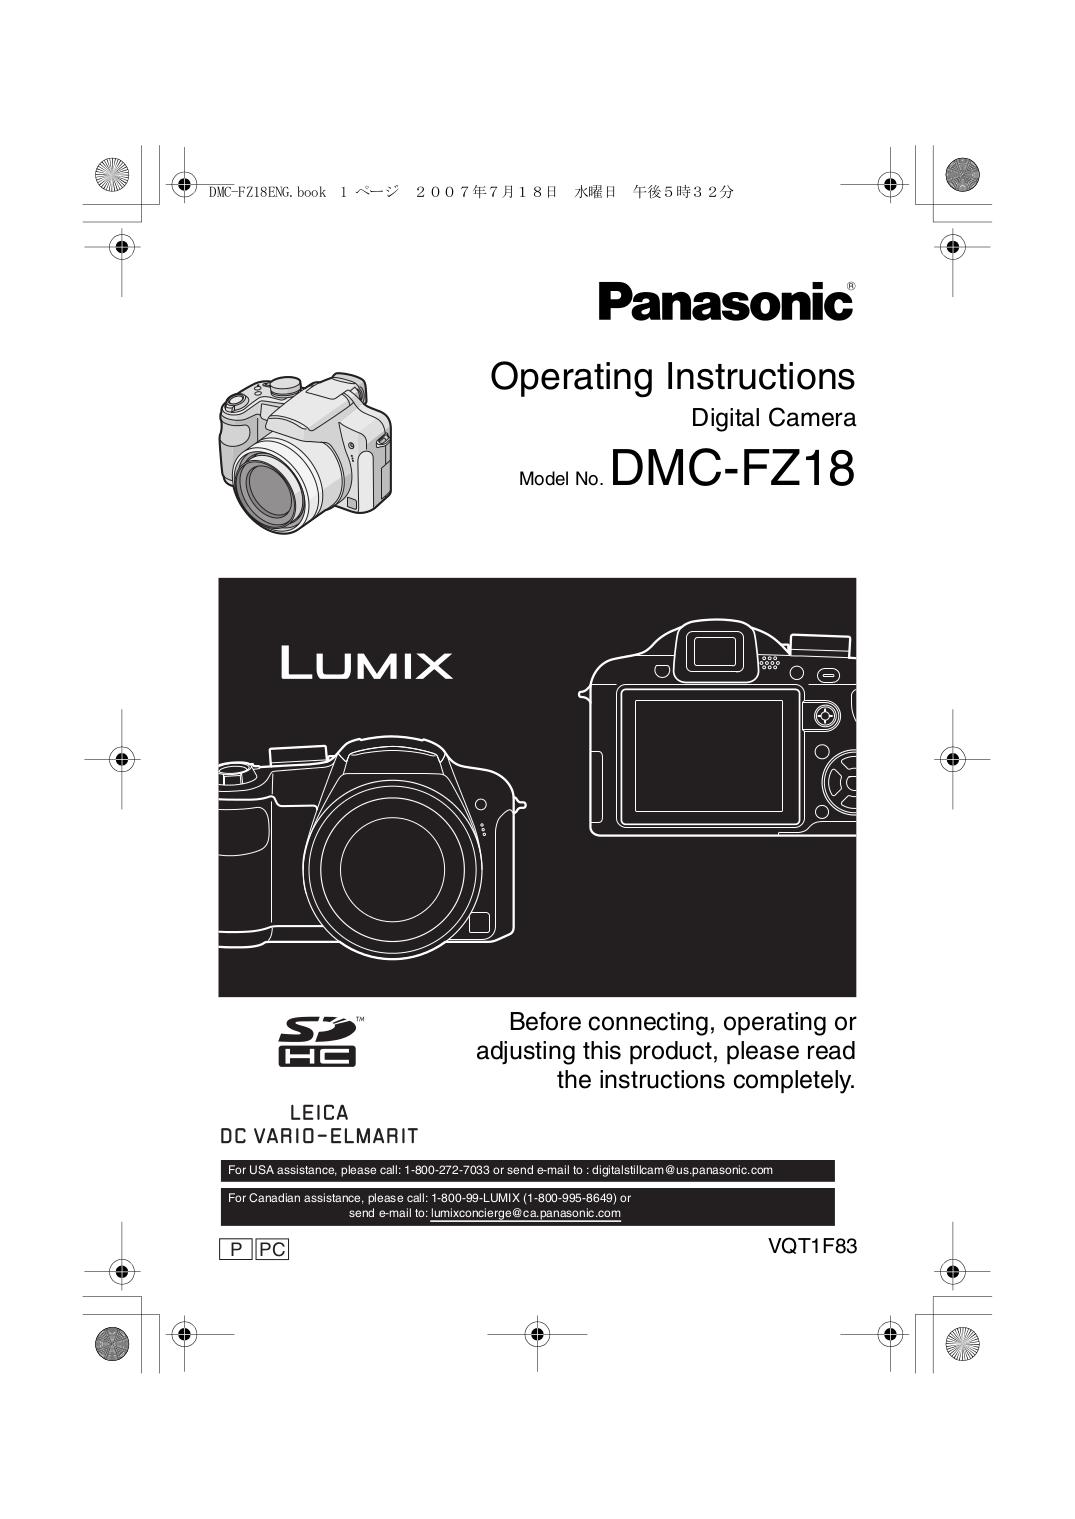 lumix g3 manual download